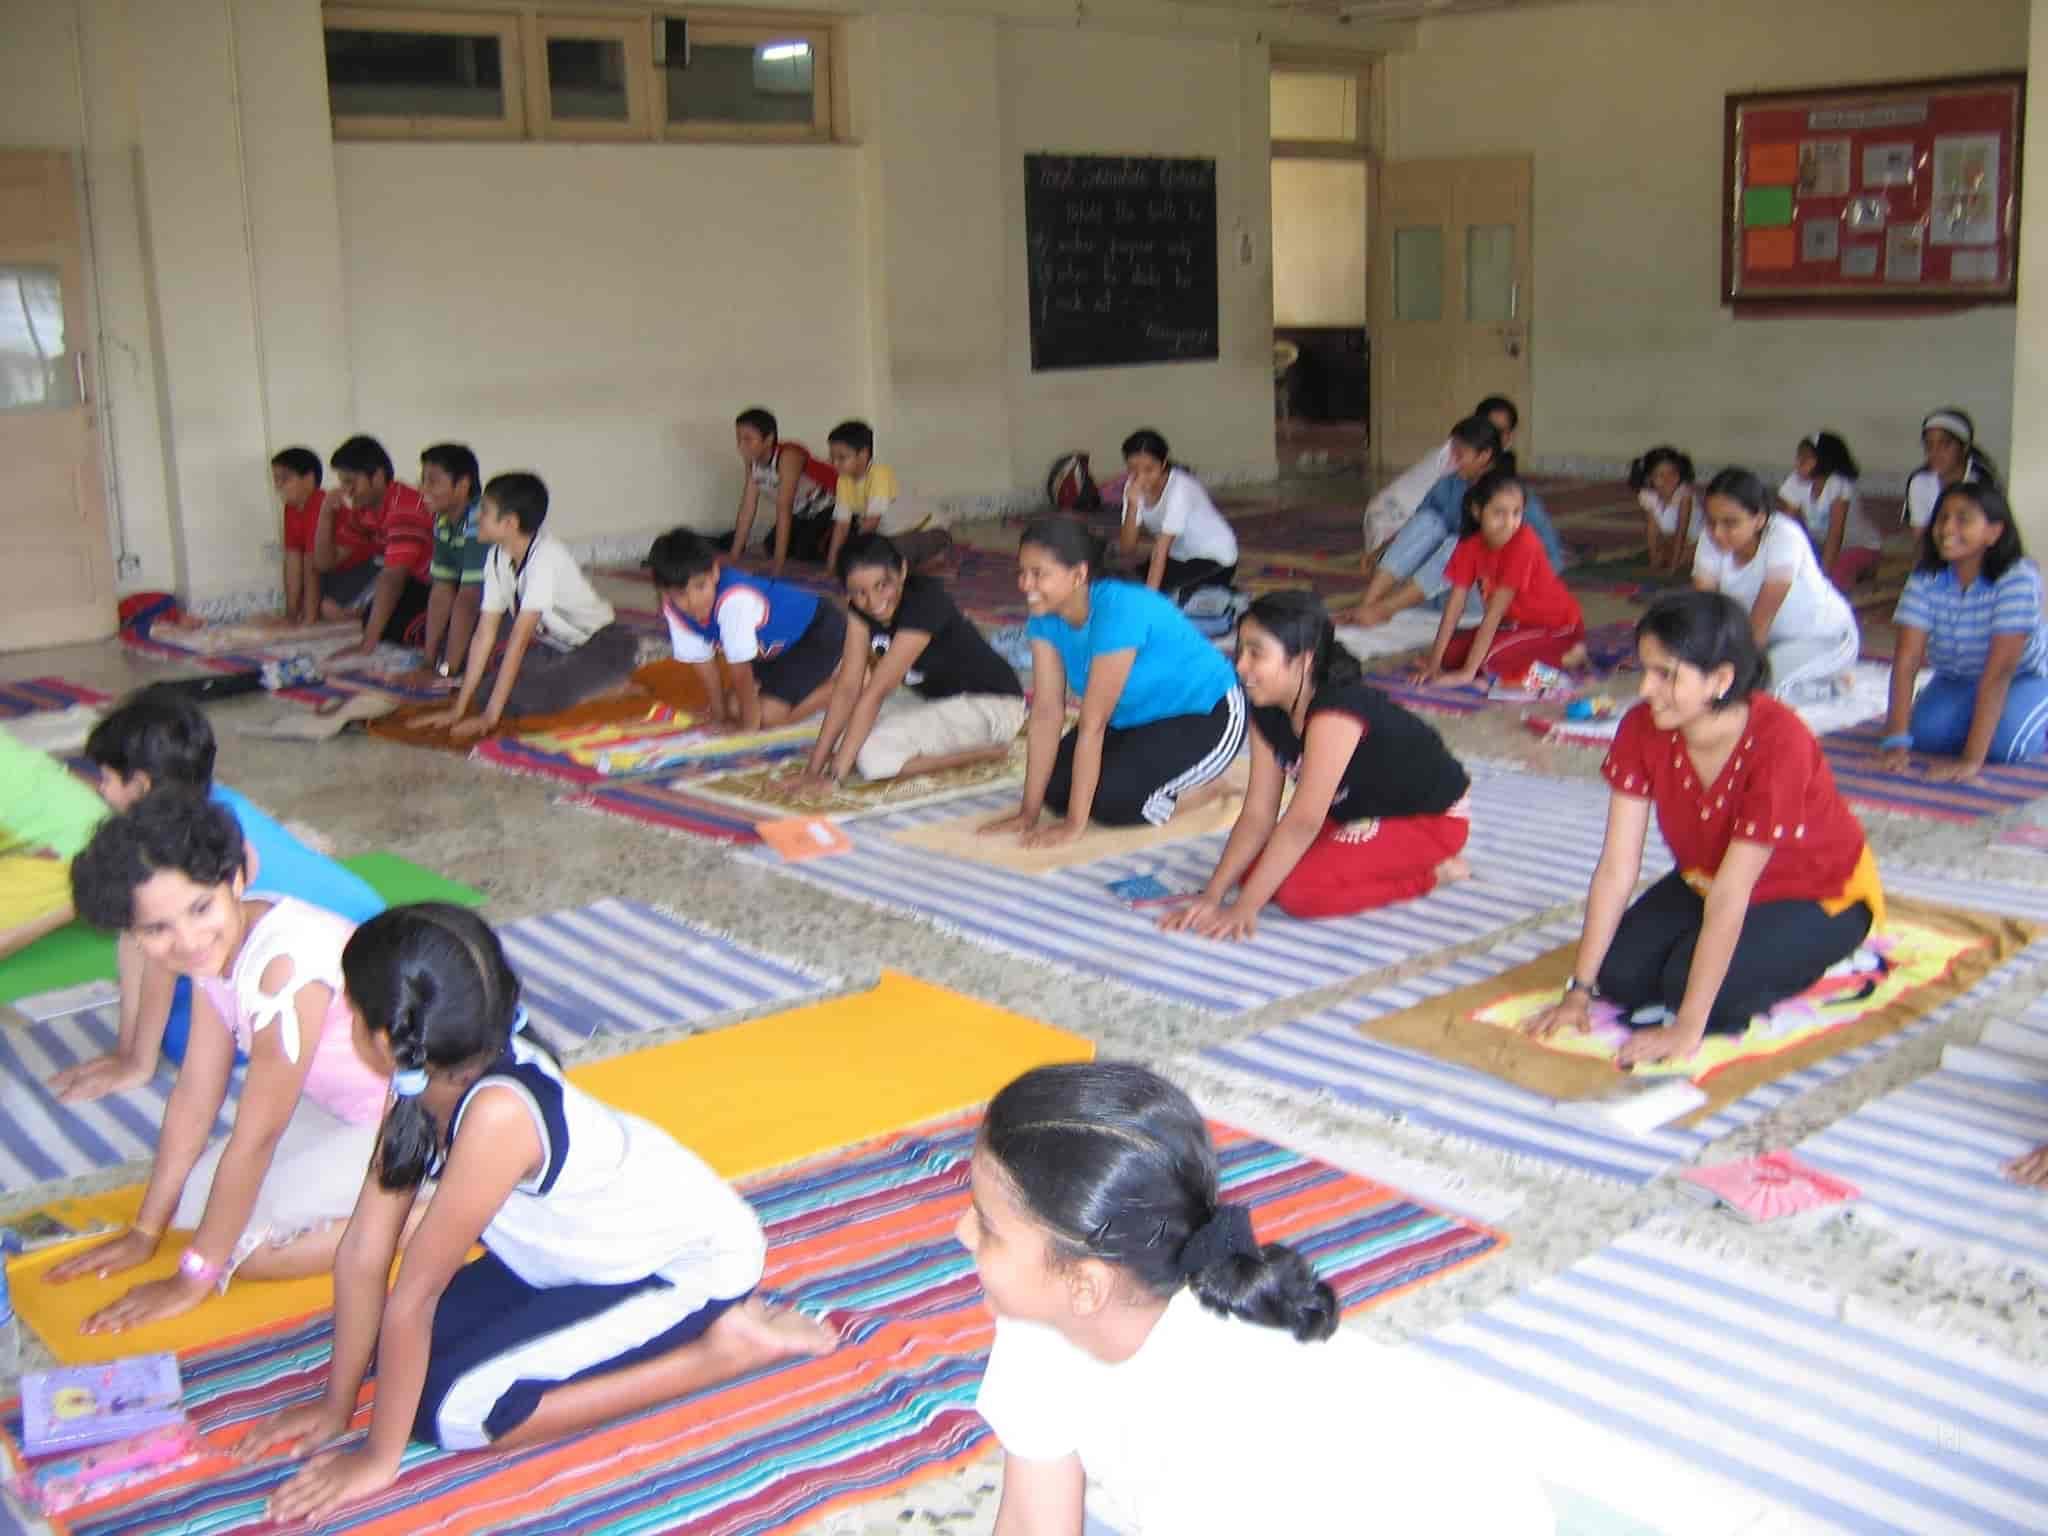 Ami Yoga Photos, Chembur East, Mumbai- Pictures & Images Gallery